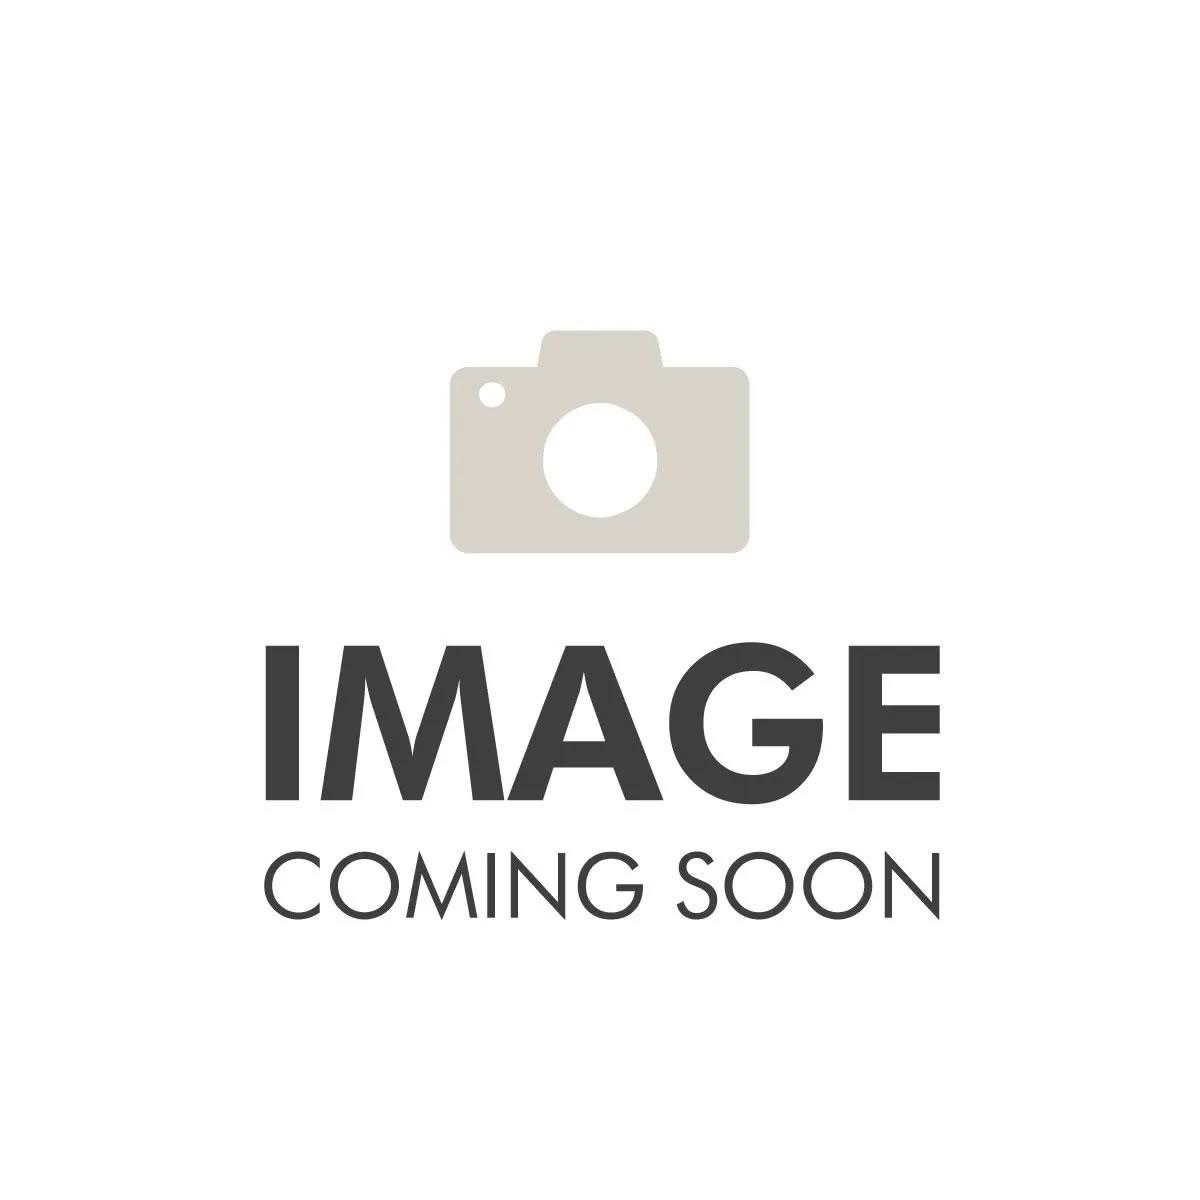 Floor Liners Kit, Frnt/Rr, Black; 15-17 Chevrolet Colorado/GMC Canyon